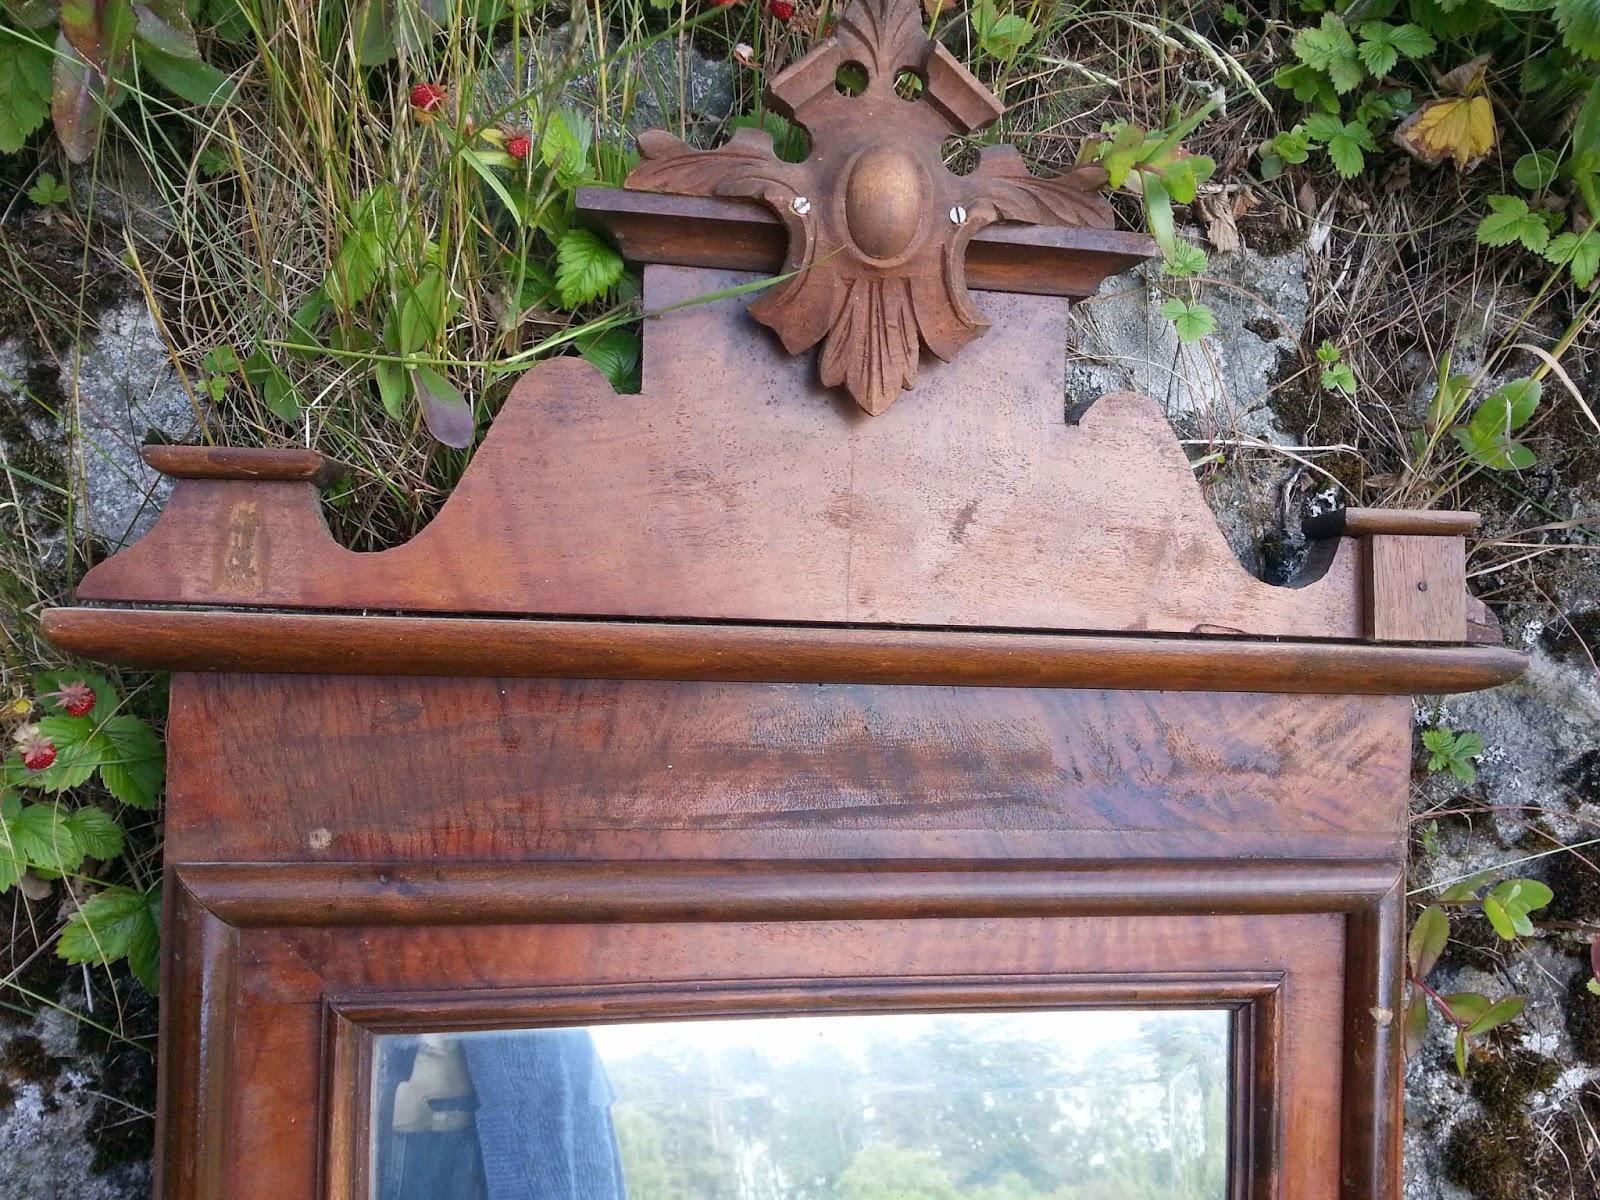 Gamle speil til salgs